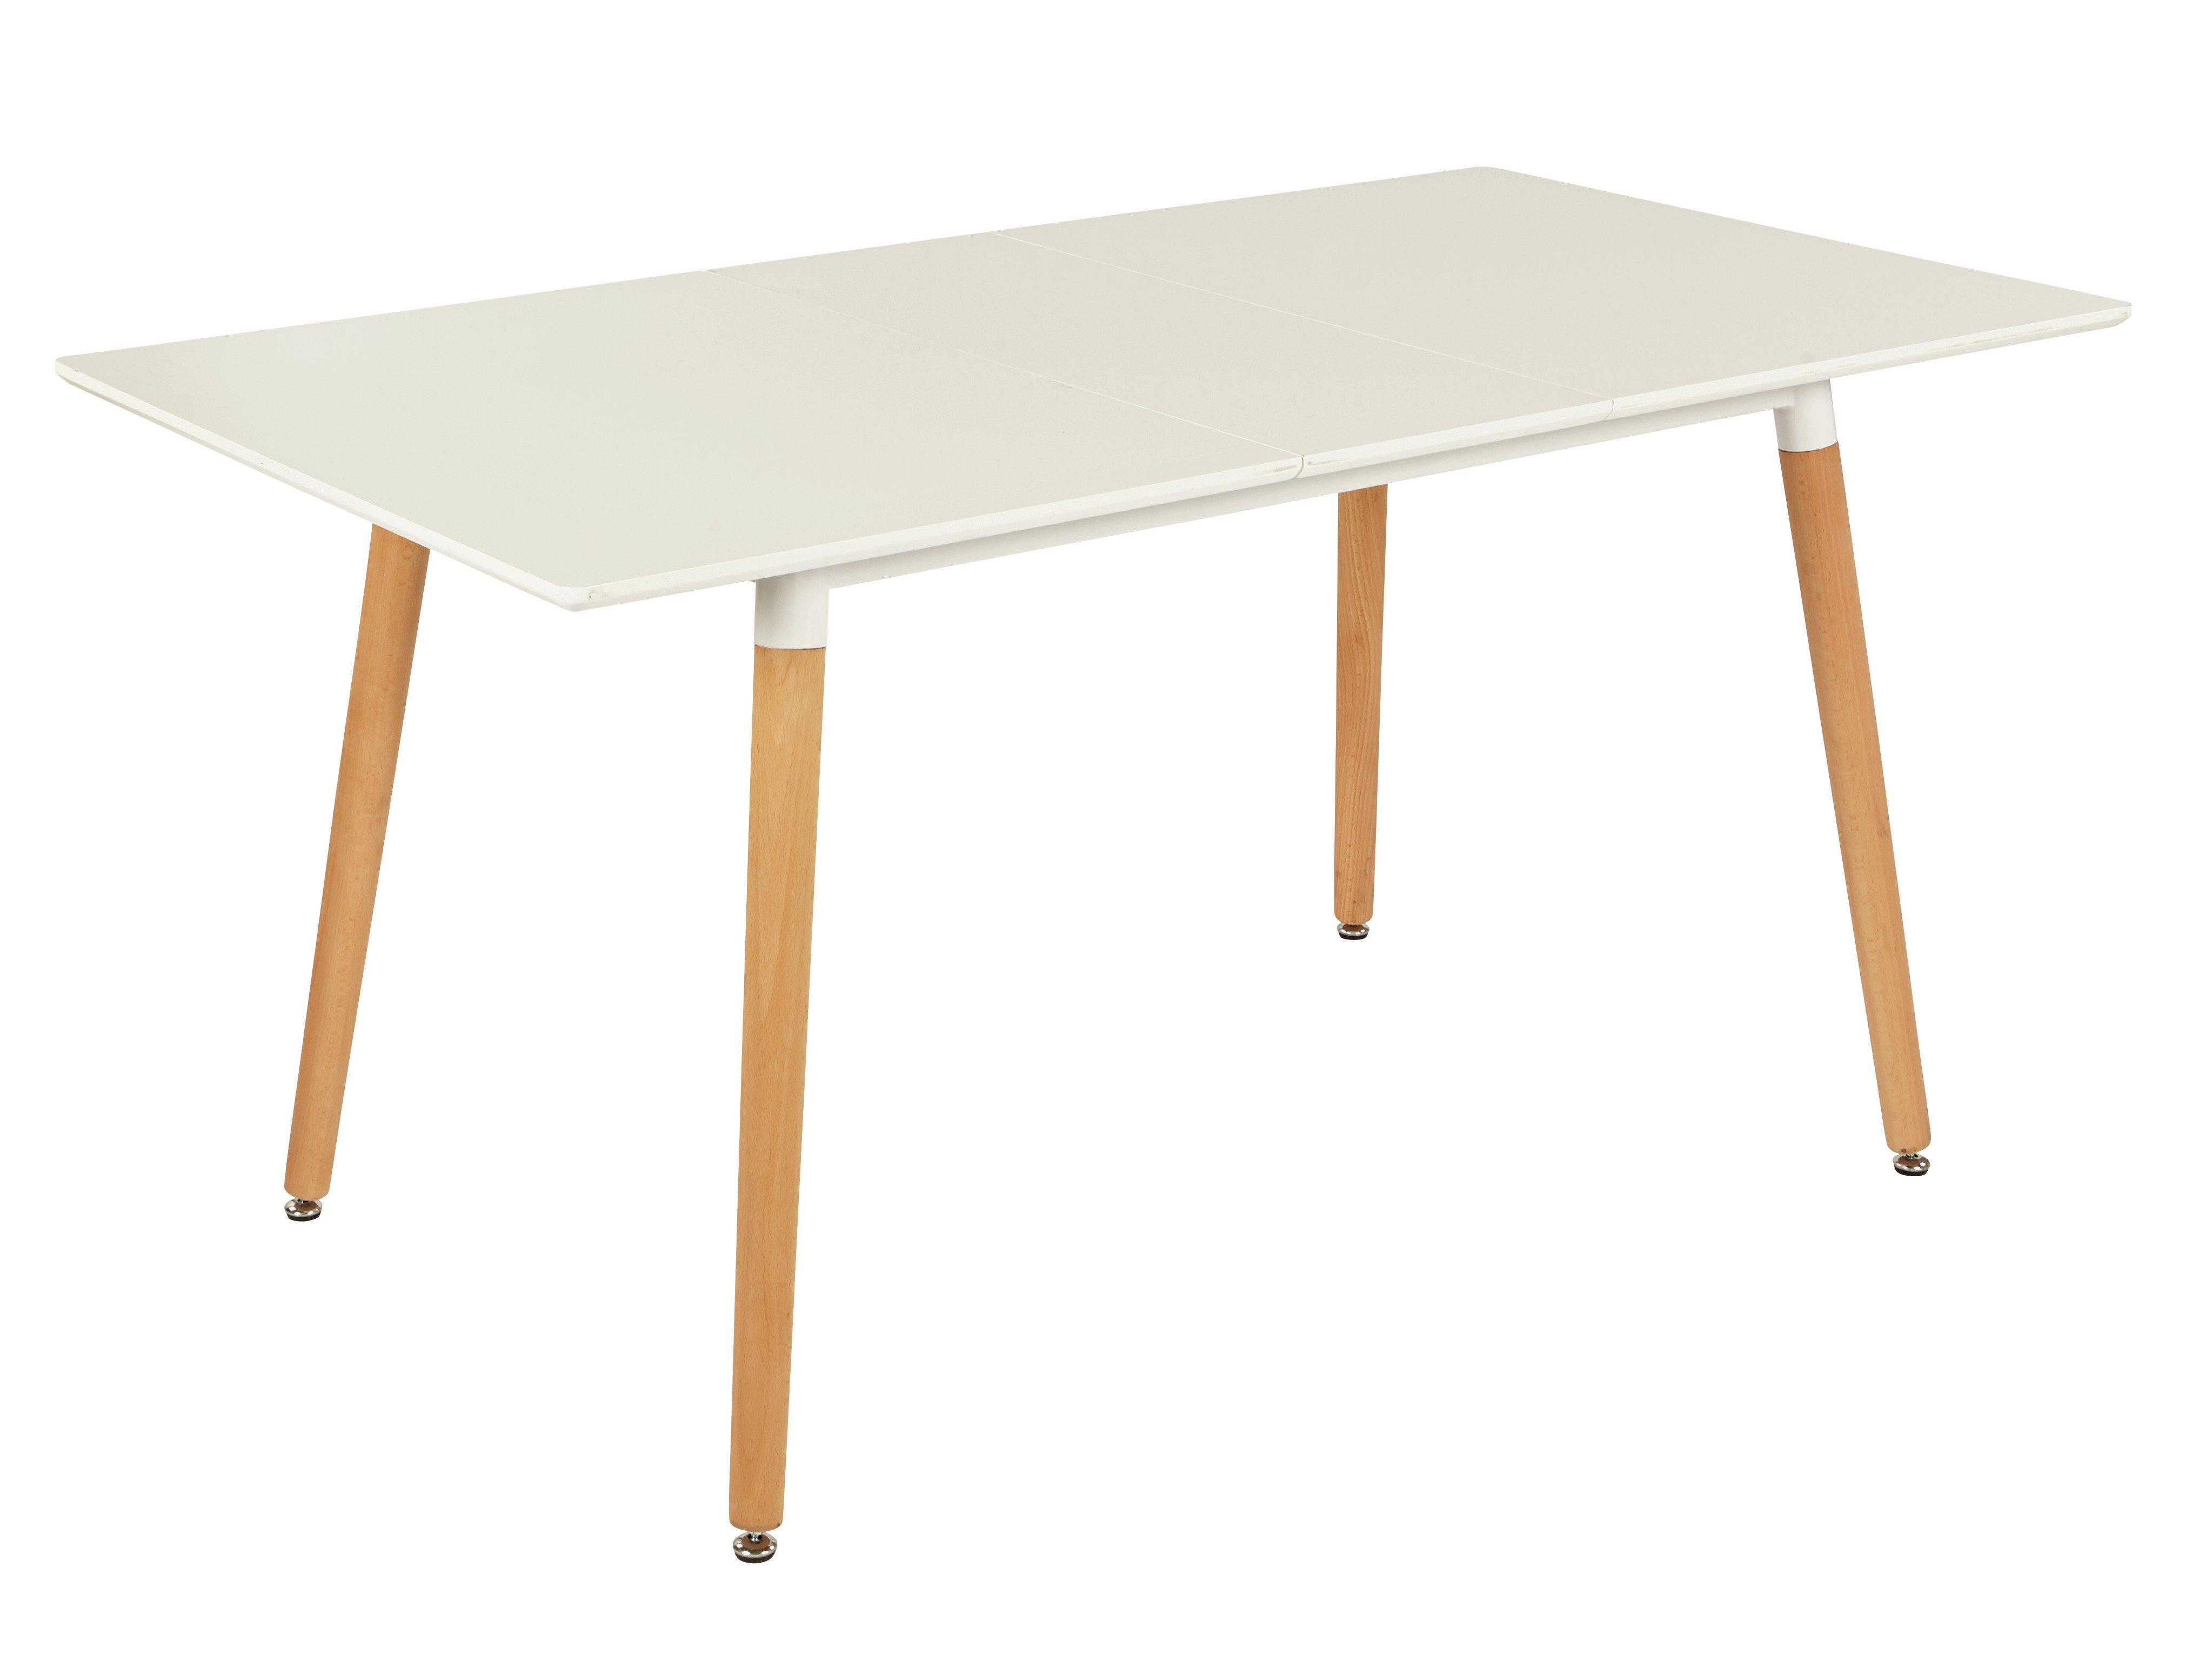 Argos Home Charlie Extending 4-6 Seater Dining Table -White